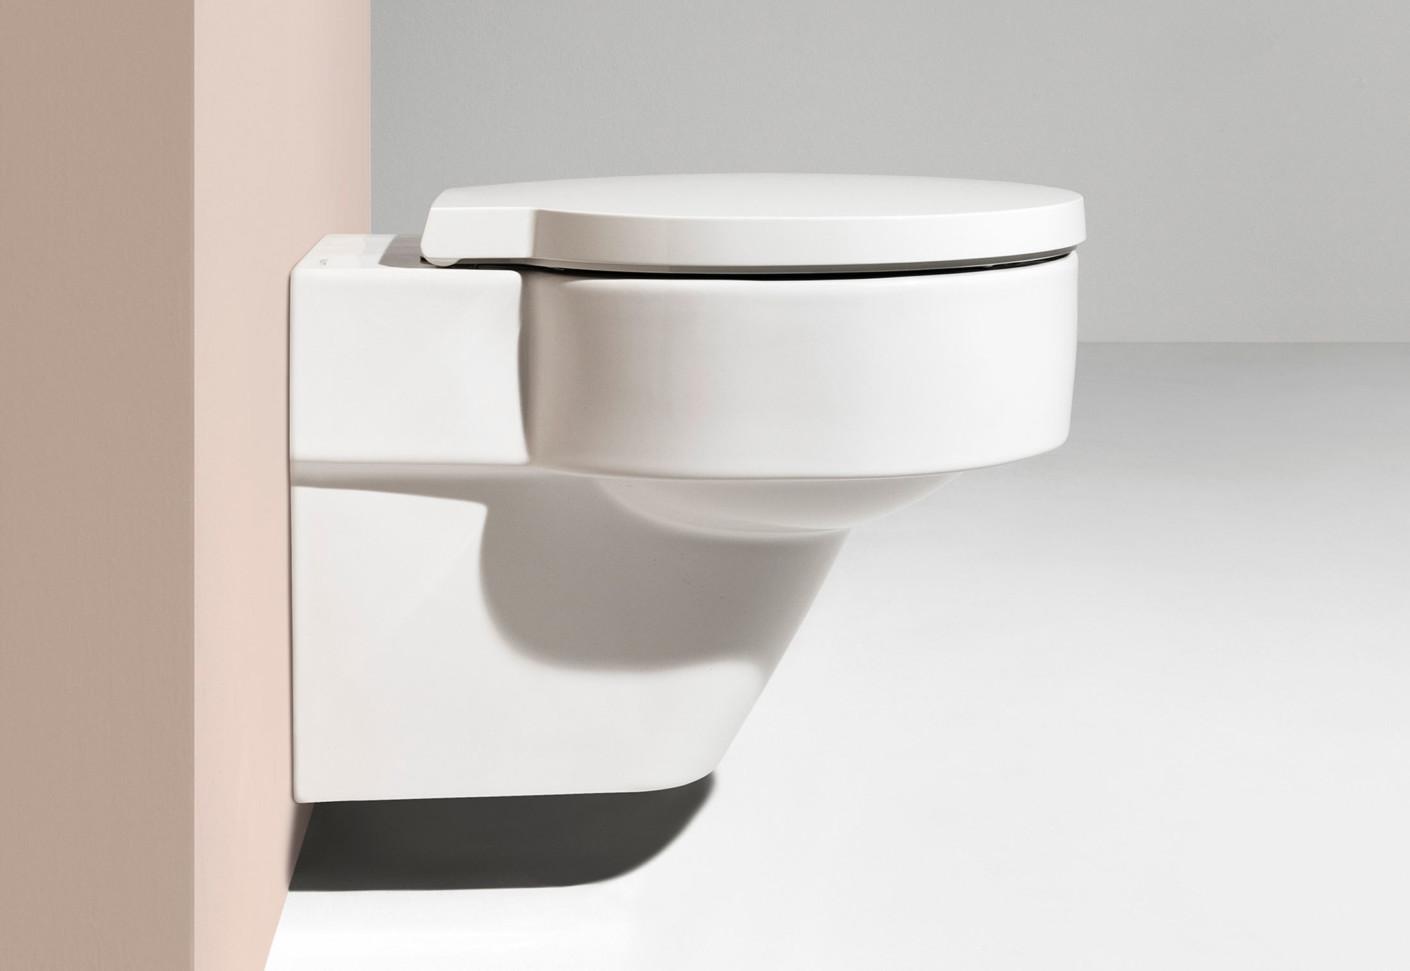 val wand wc randlos von laufen stylepark. Black Bedroom Furniture Sets. Home Design Ideas